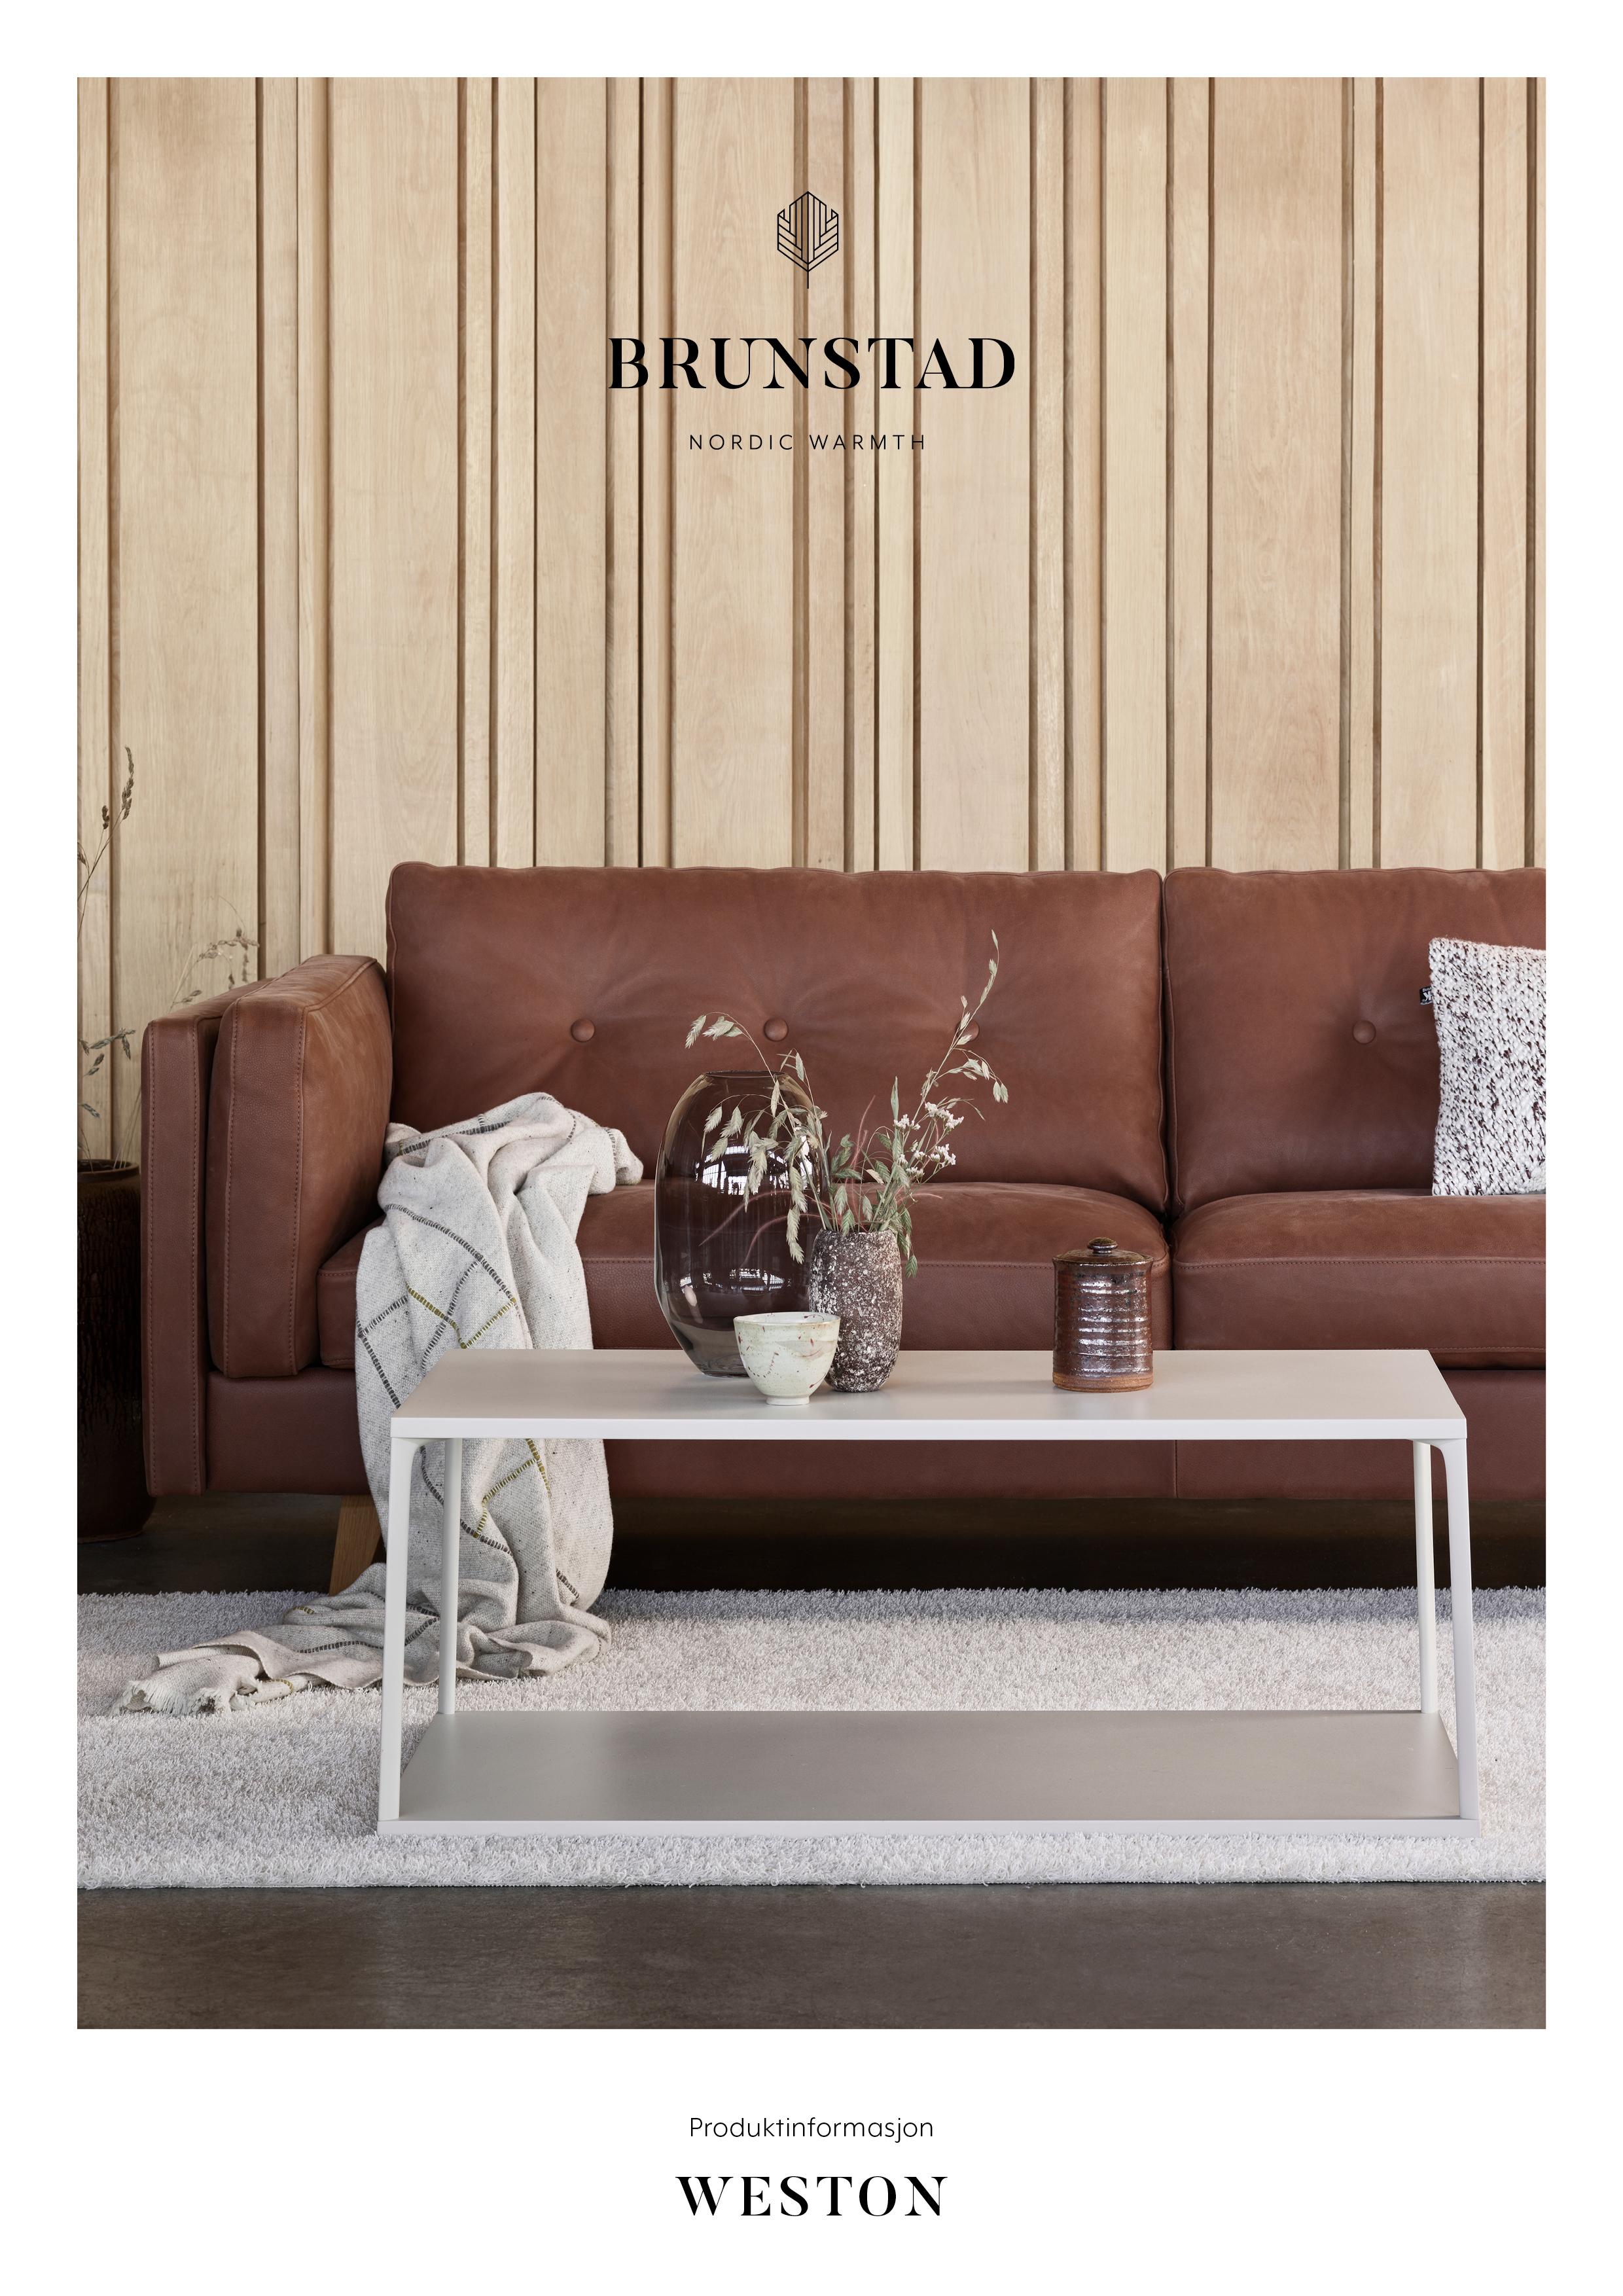 Flow Brunstad AS